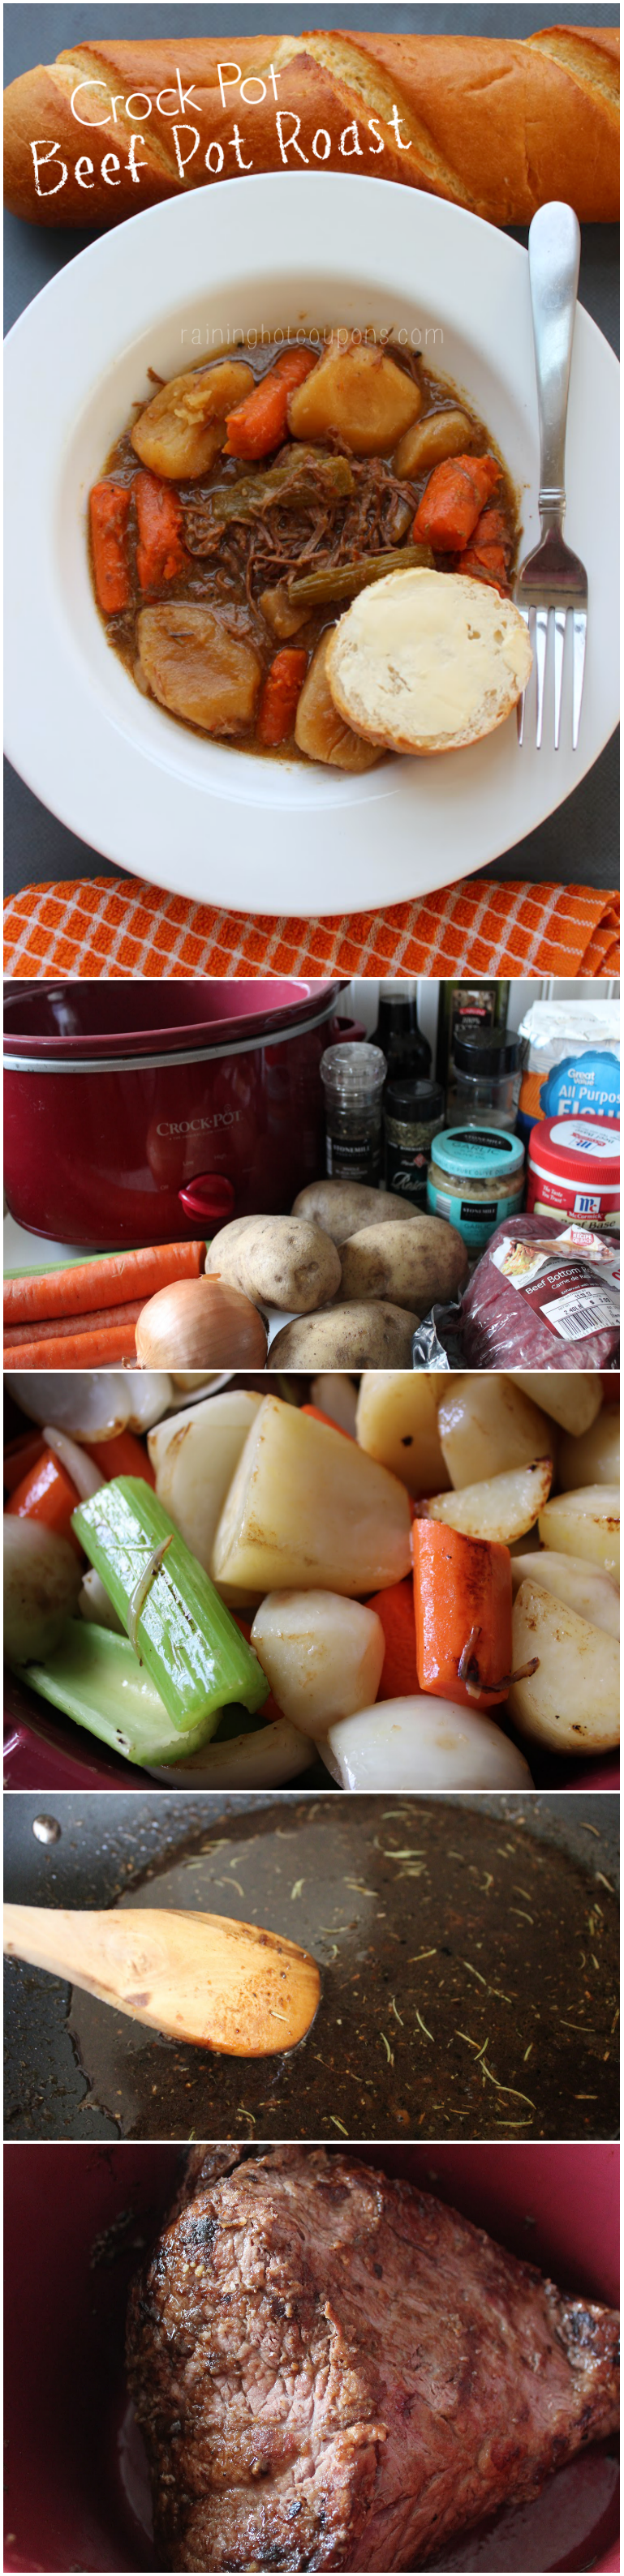 beef pot roast collage